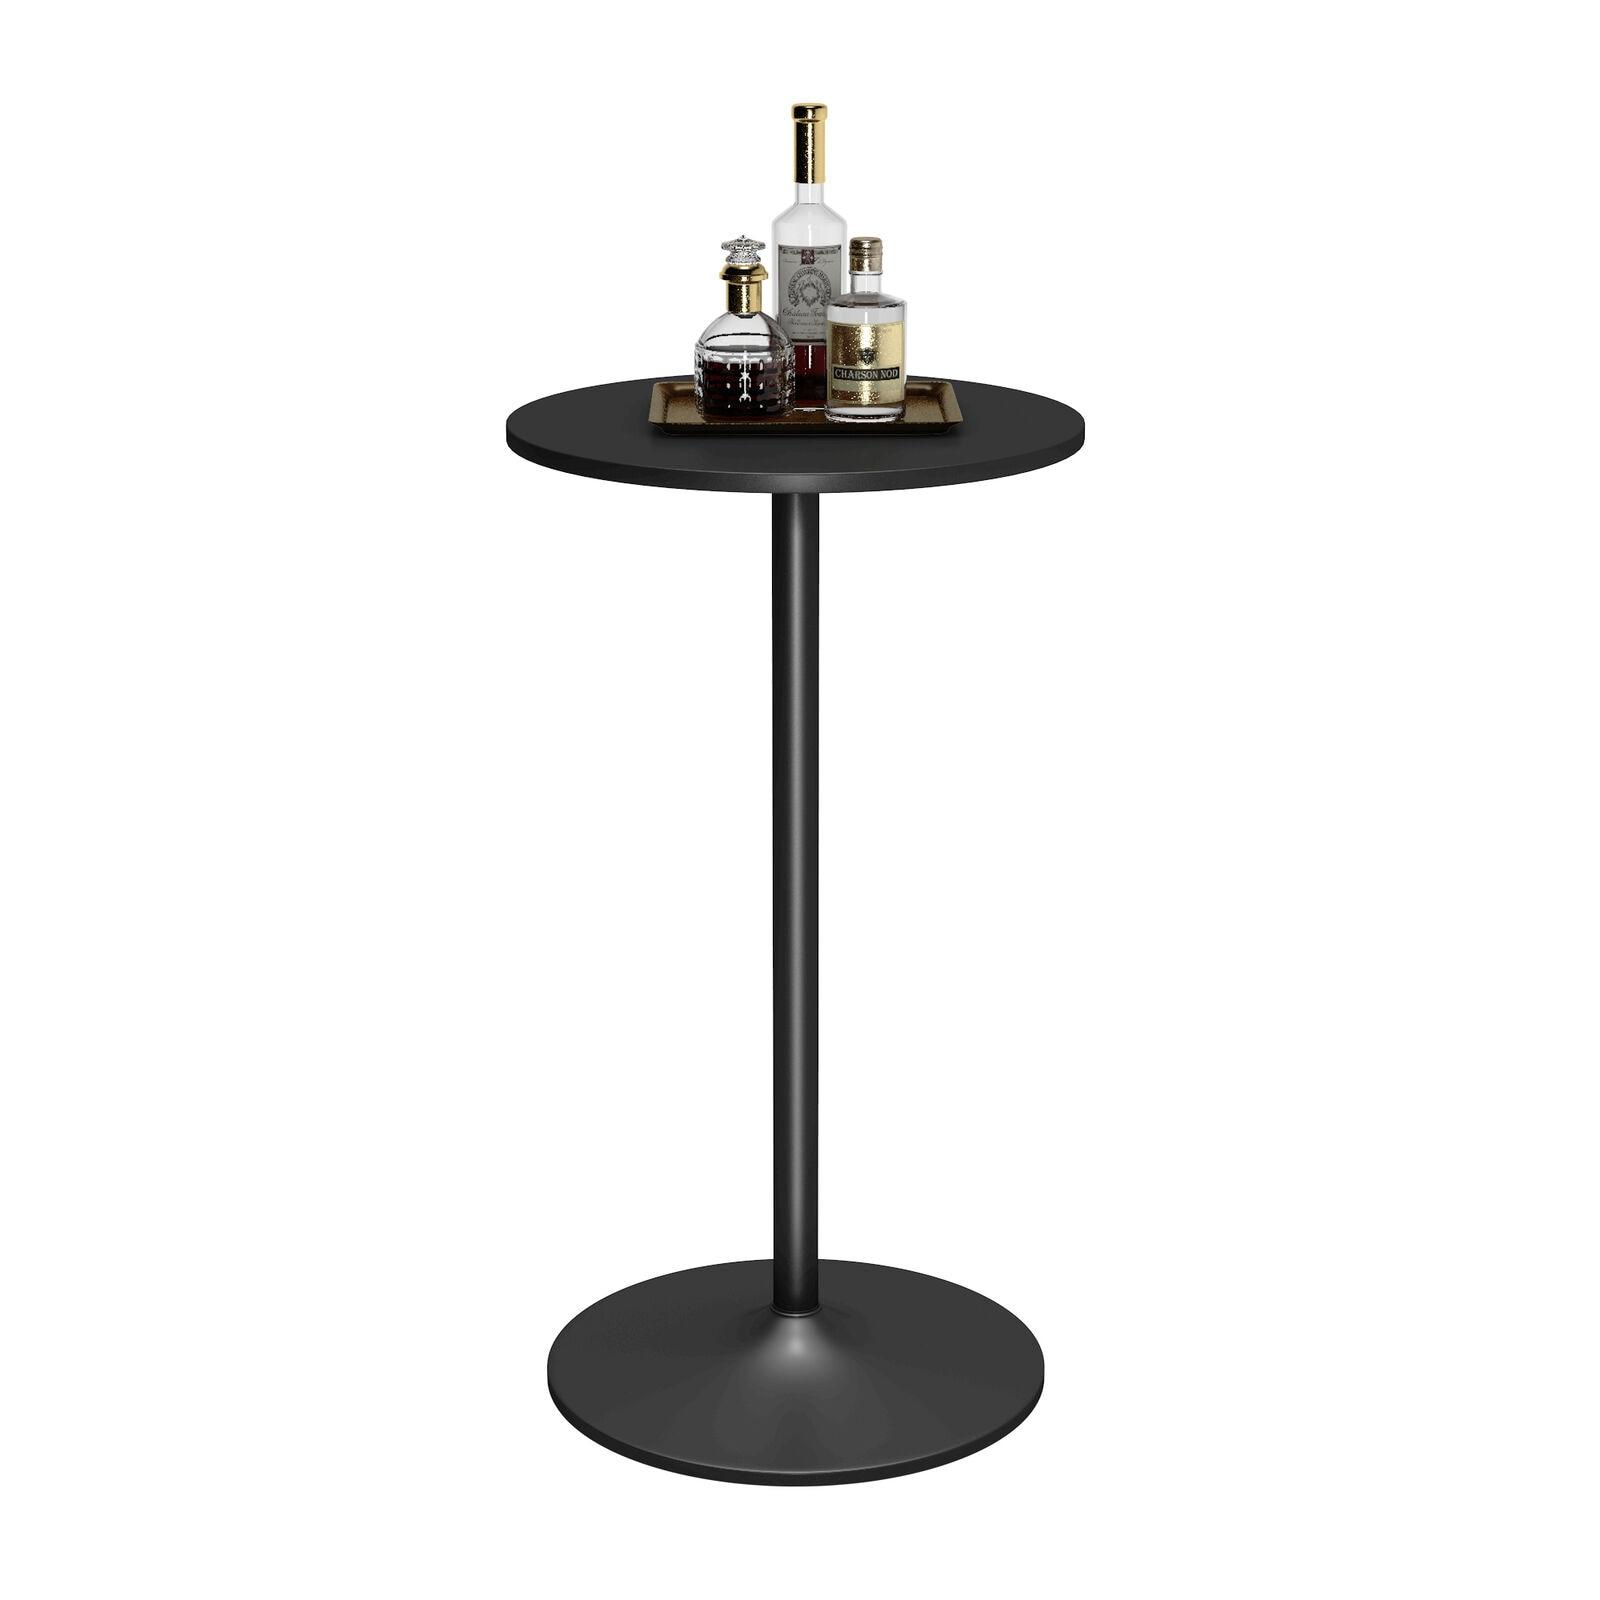 Costway 24'' Dia Round Bar Table Bistro Pub Counter Home Outdoor Indoor Kitchen Furniture